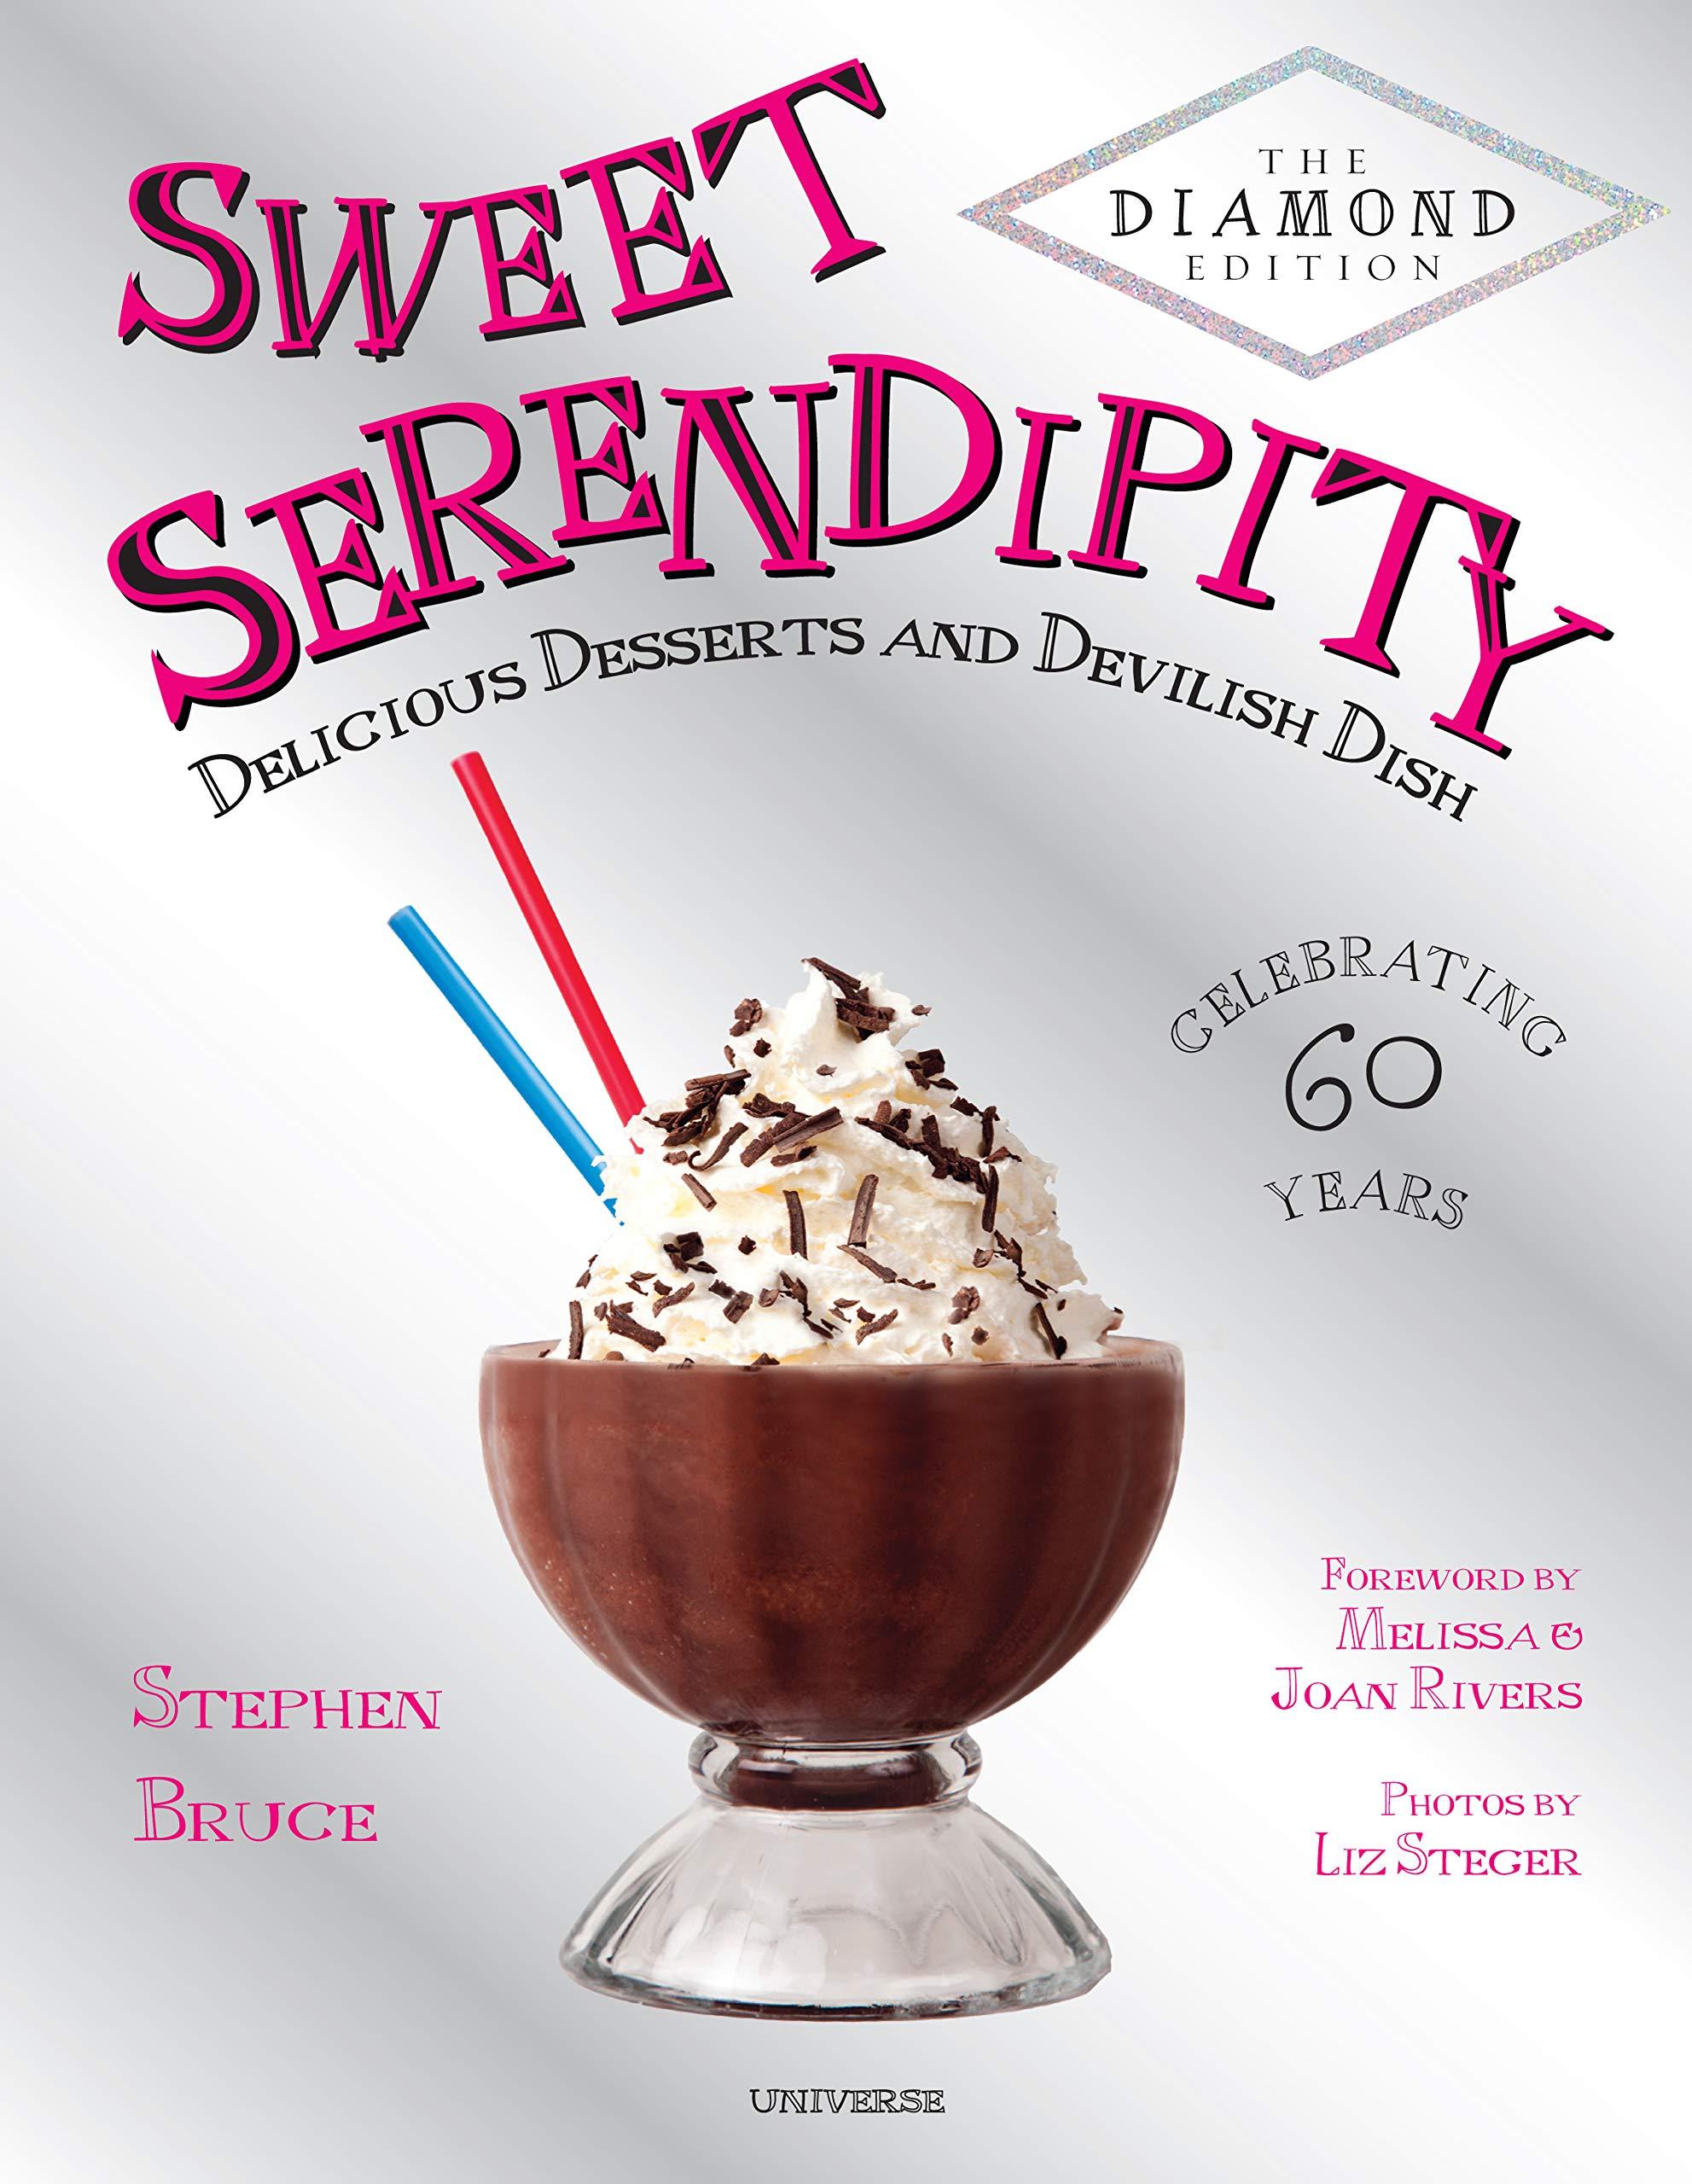 Sweet Serendipity: Delicious Desserts and Devilish Dish (Rizzoli Classics) by Rizzoli